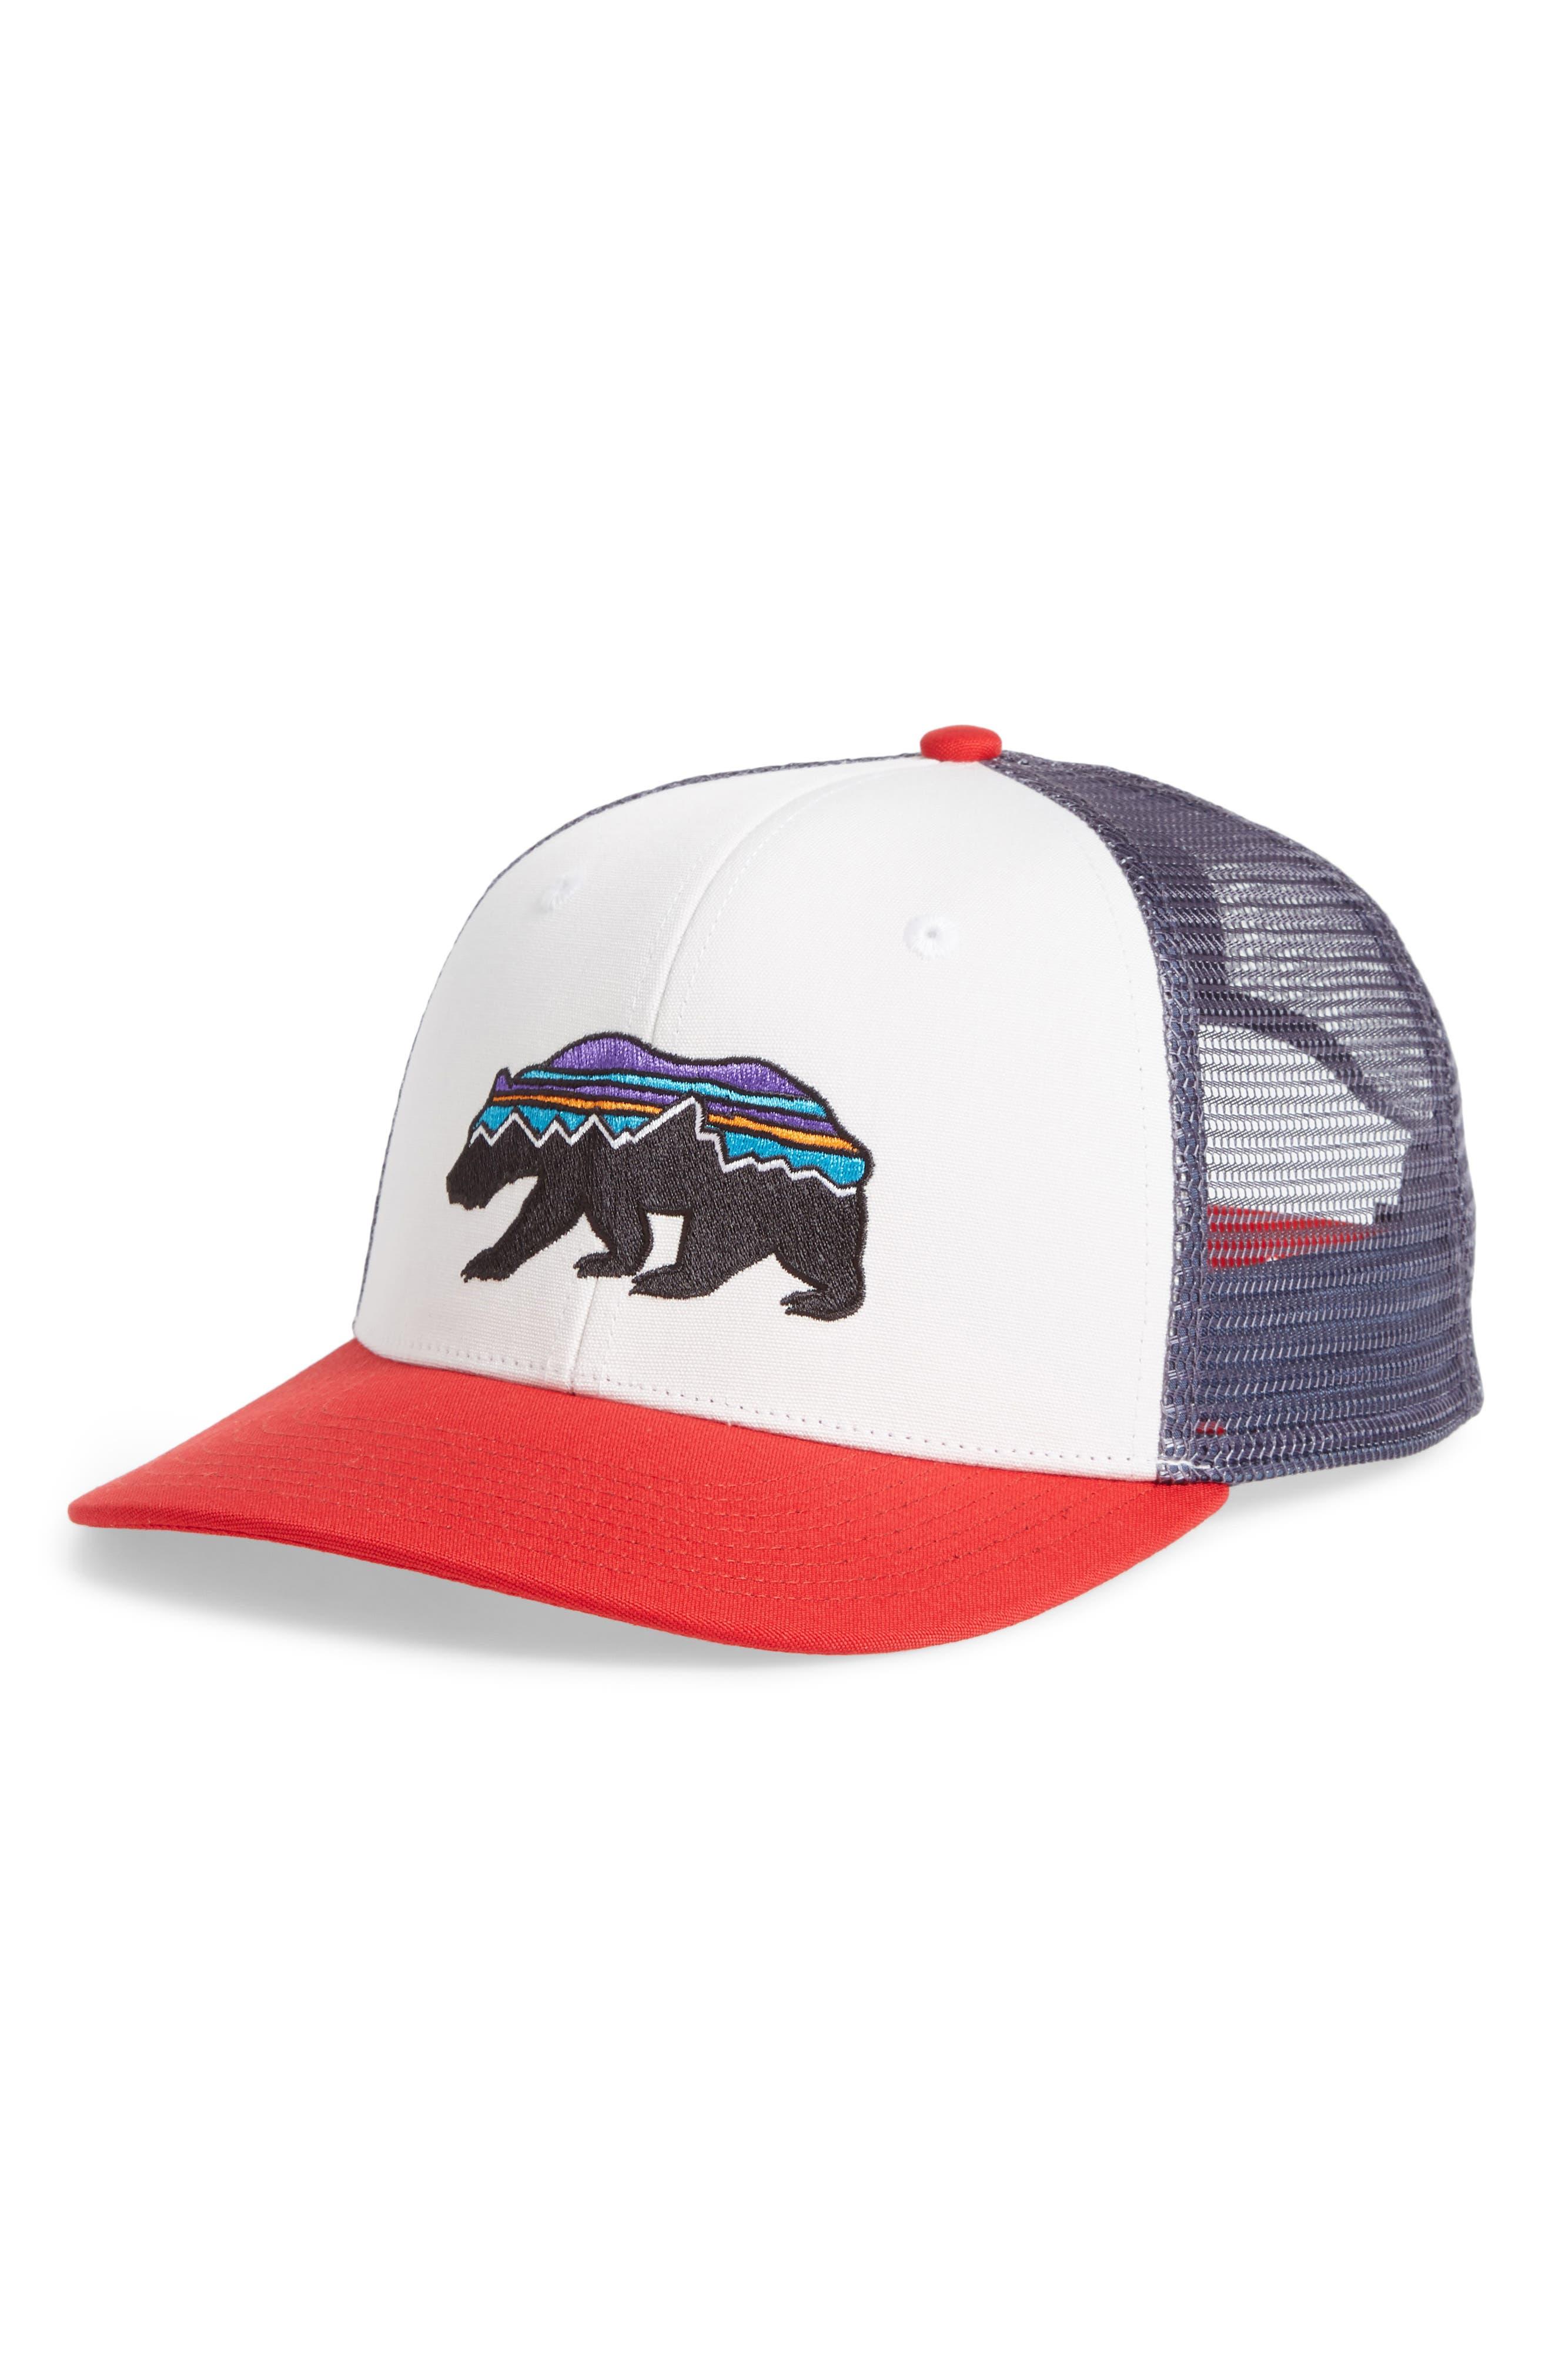 PATAGONIA Fitz Roy Bear Trucker Cap, Main, color, WHITE